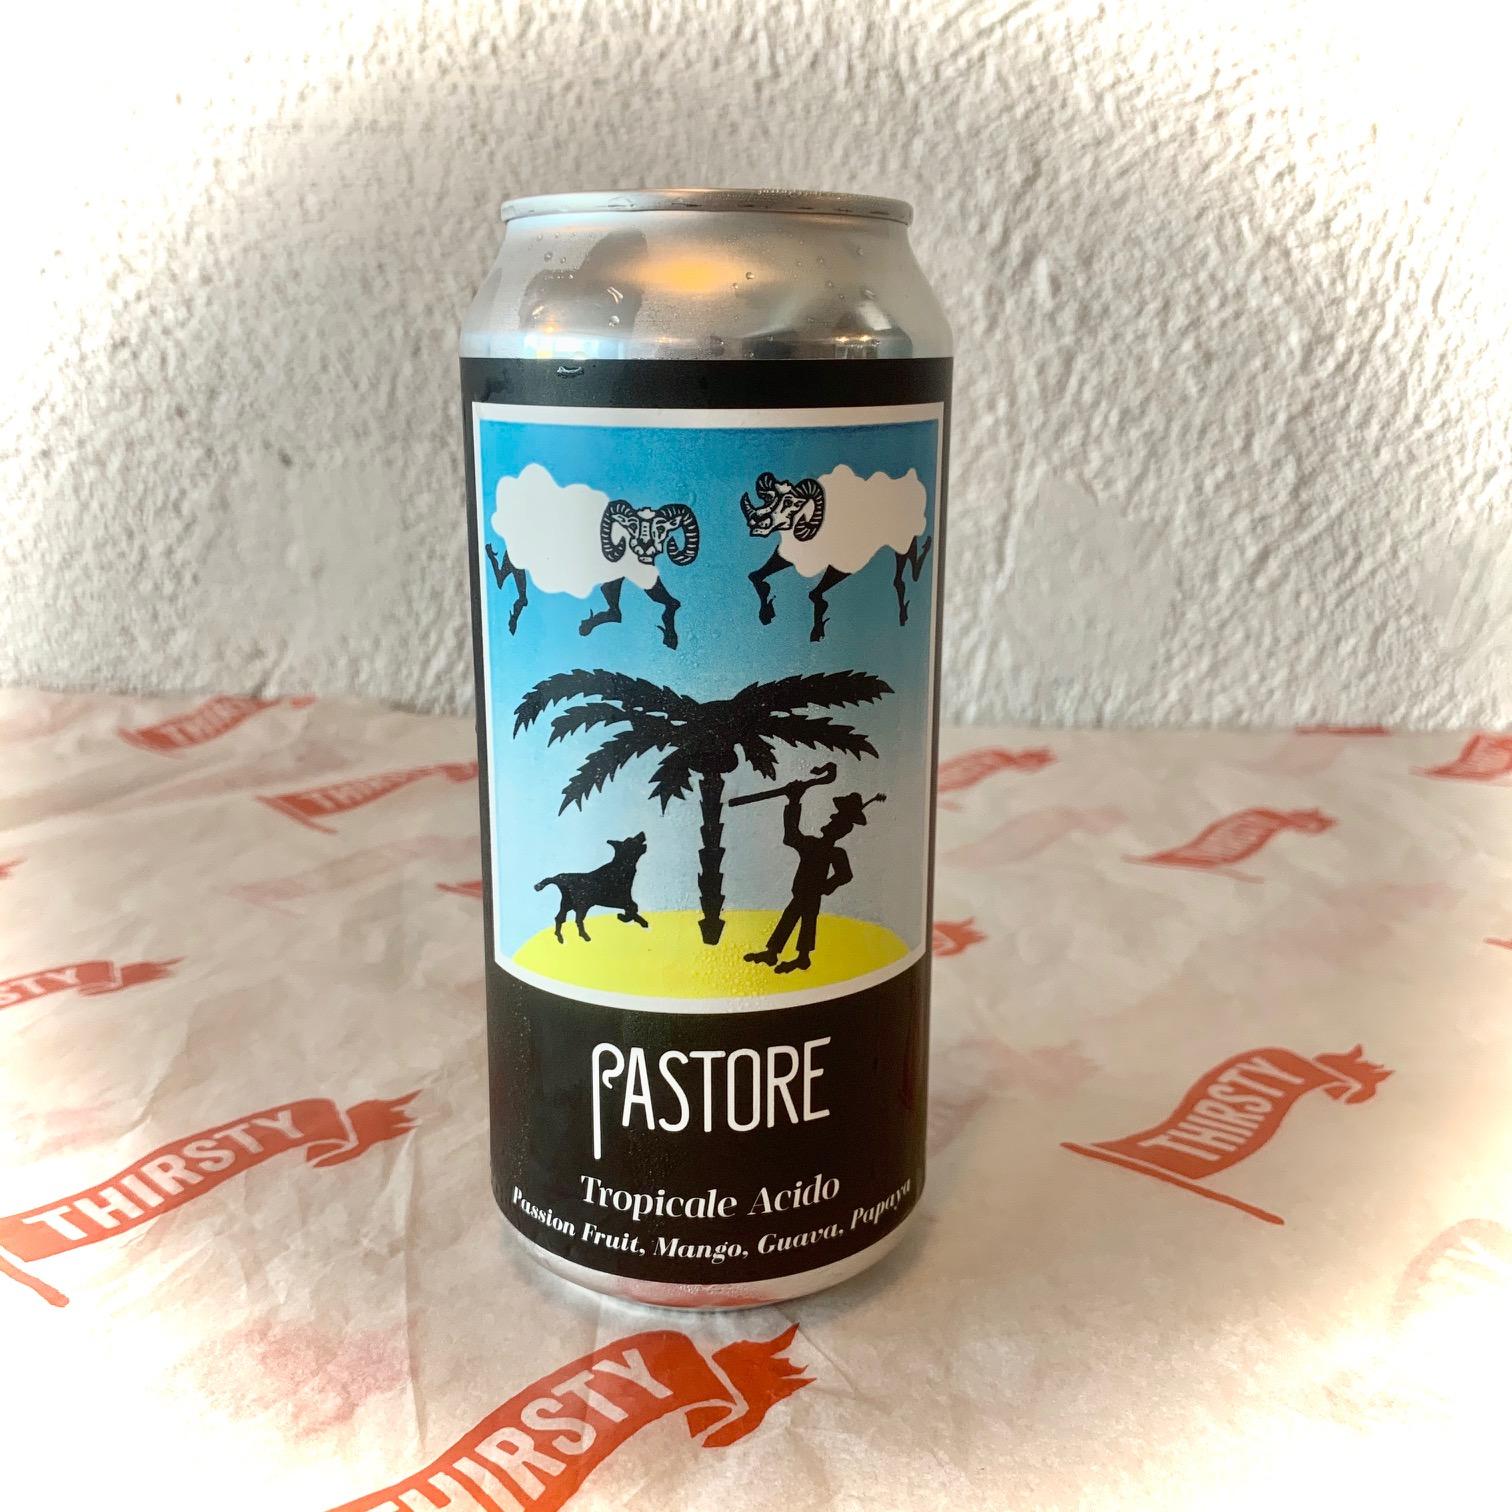 Pastore | Tropicale Acido | Passionfruit, Mango, Guava & Papaya Waterbeach Weisse 7% 440ml